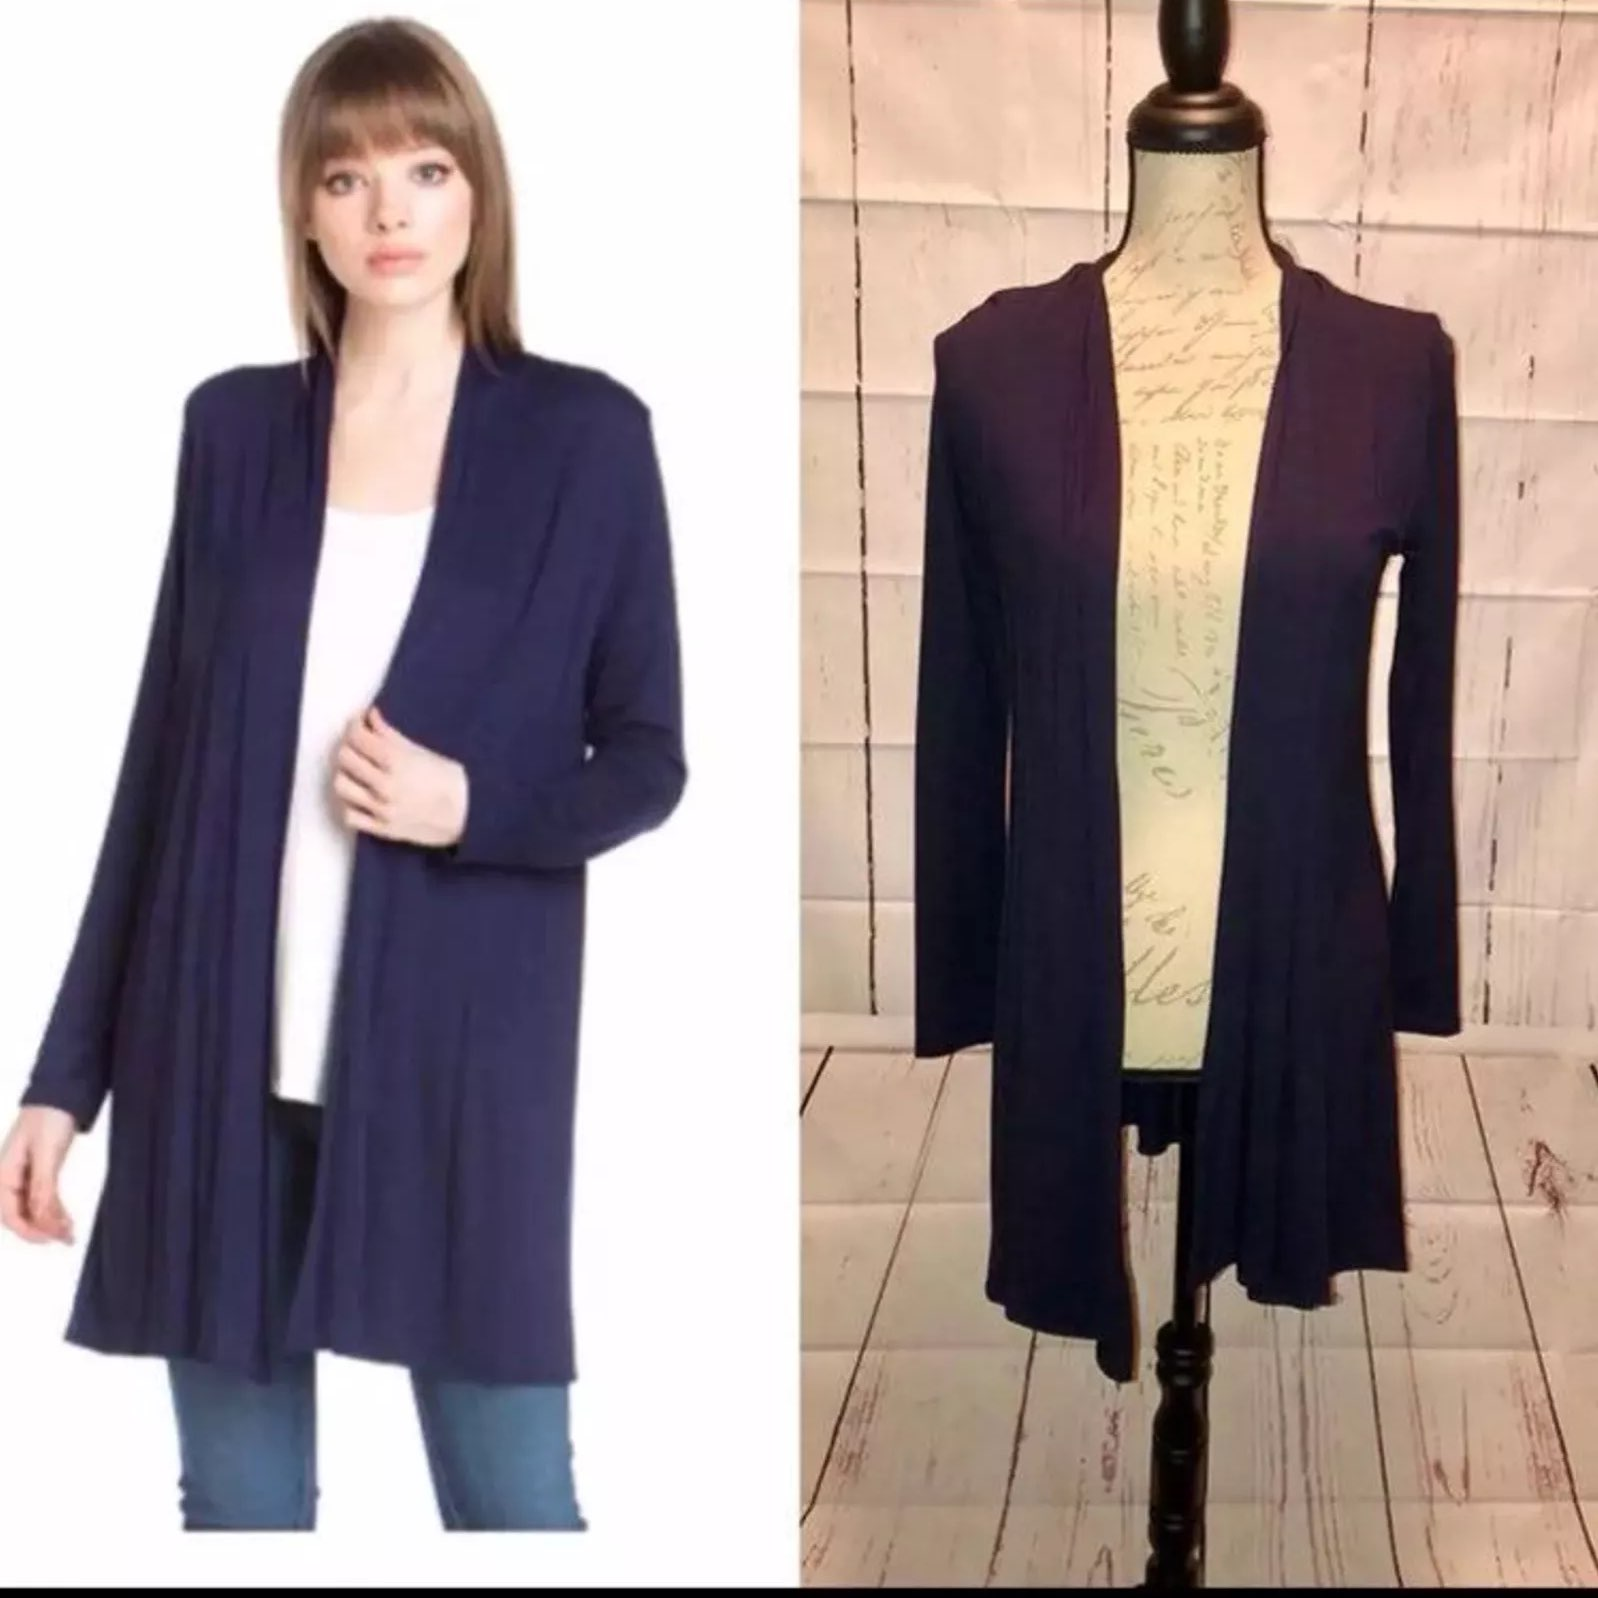 NWT NAVY BLUE CARDIGAN XL - Mercari: BUY & SELL THINGS YOU LOVE